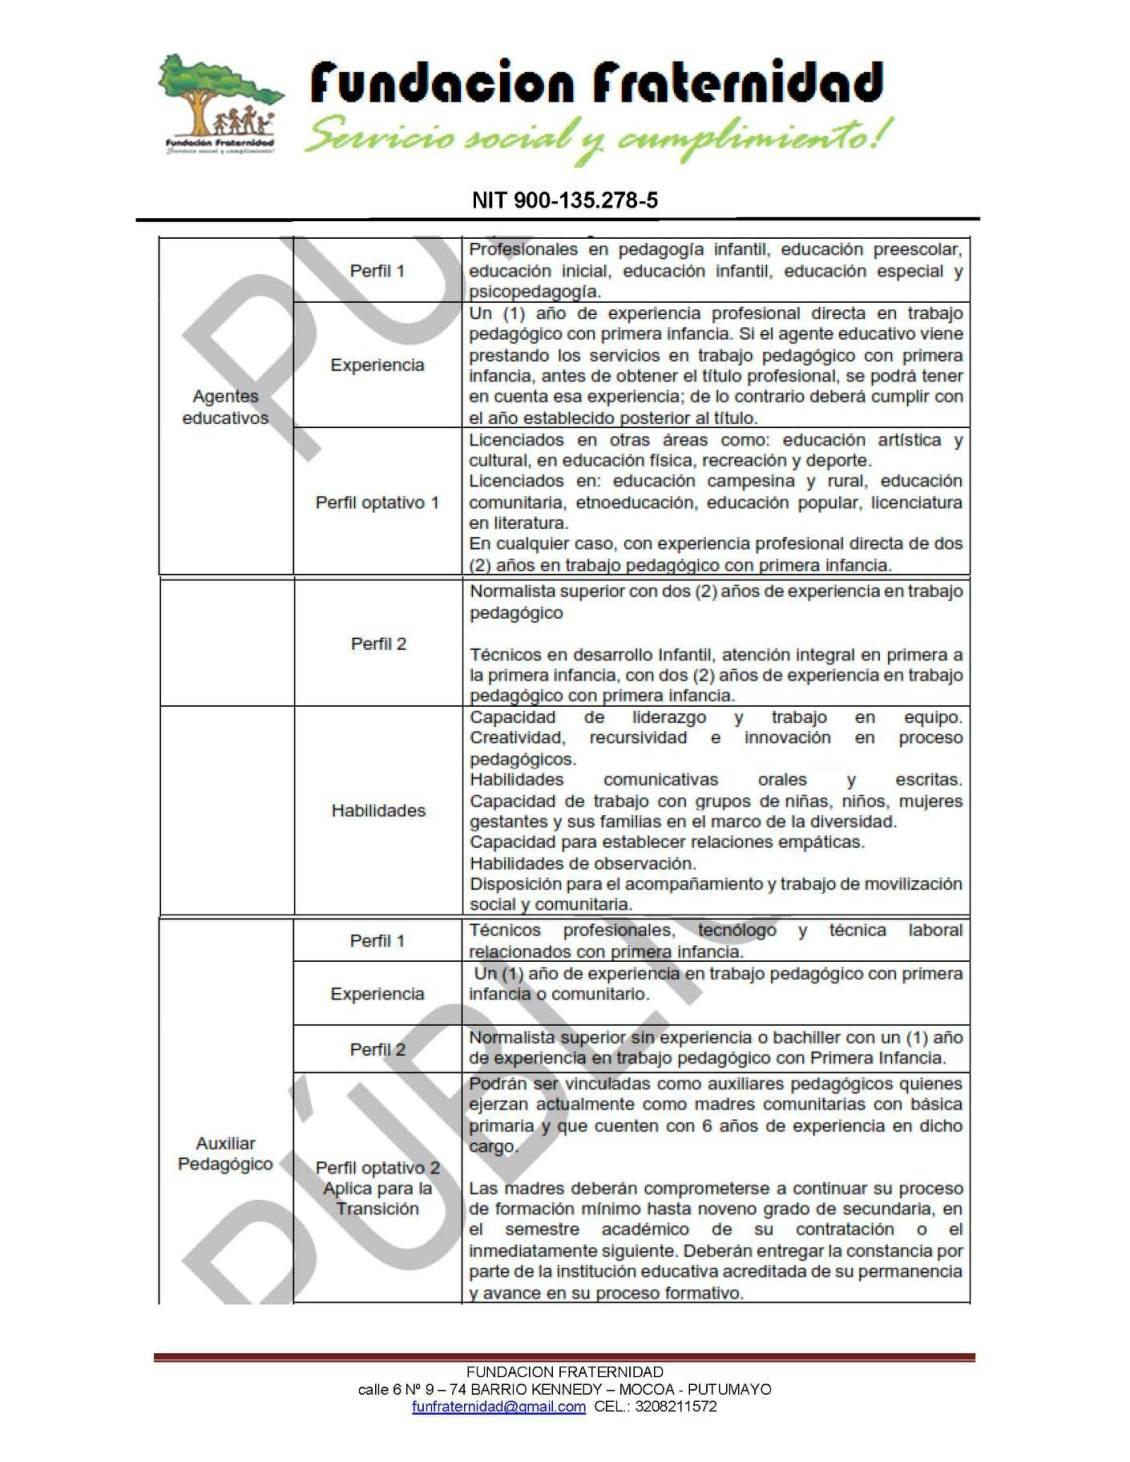 fundacion-fraternidad-abre-convocatoria-laboral-nro-002-2021-2